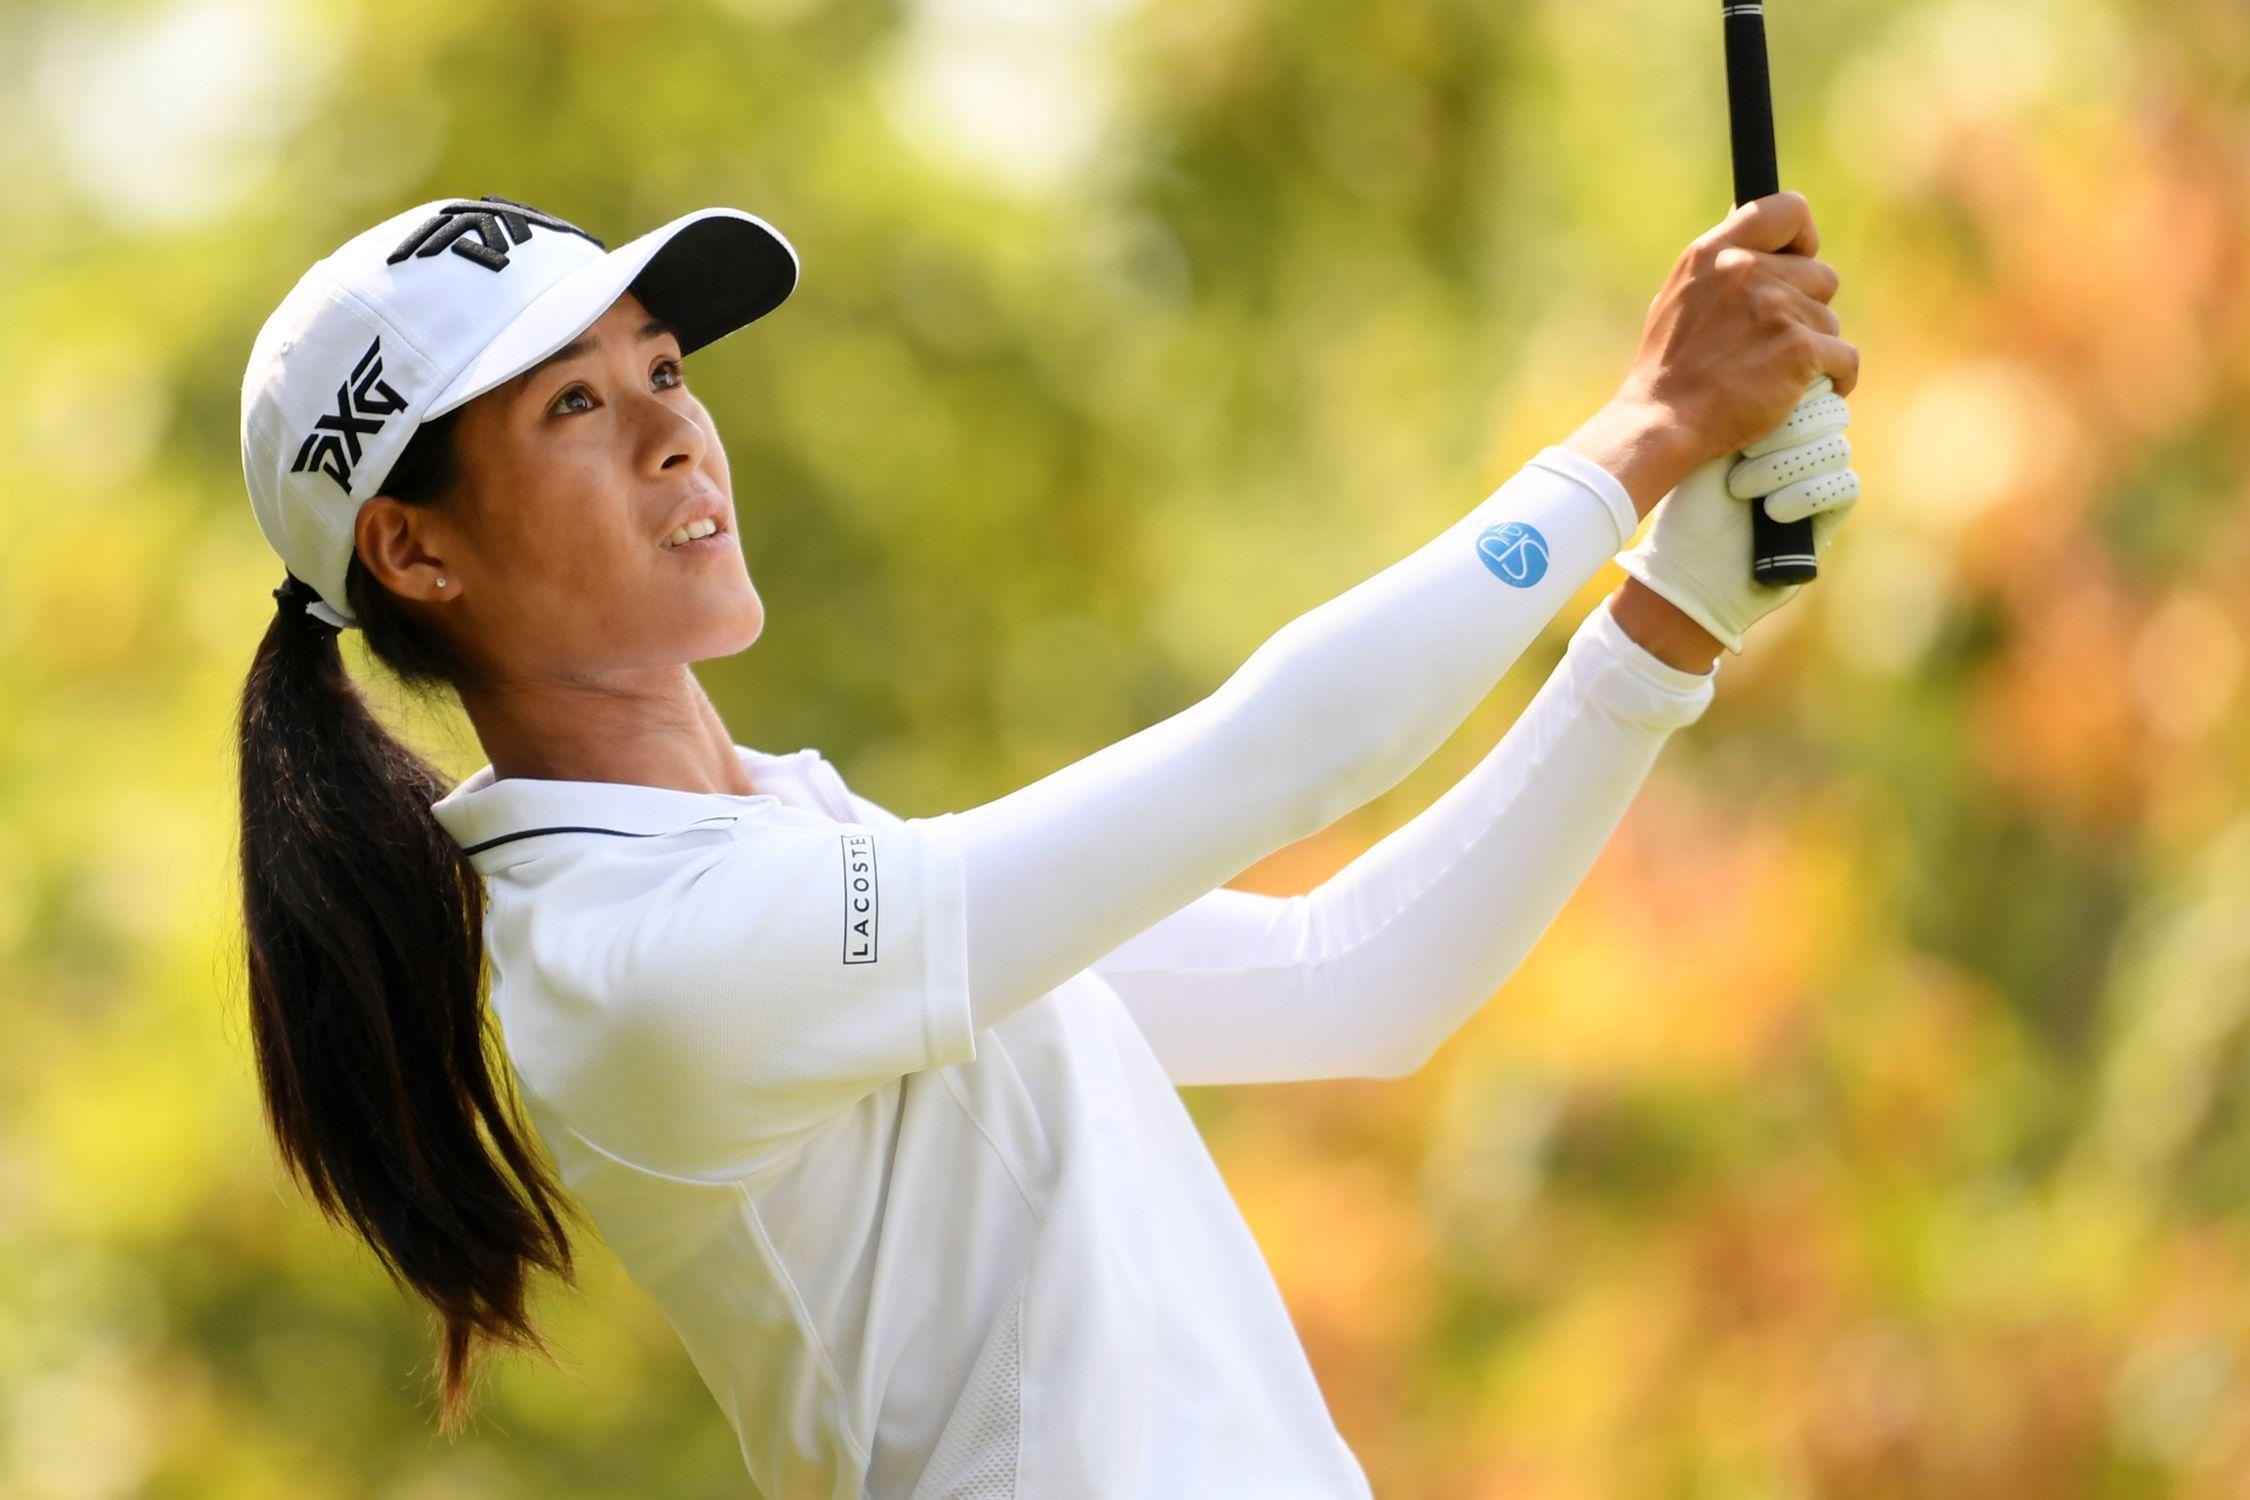 Golf - Tournois majeurs - British Open féminin : dernier de cordée...